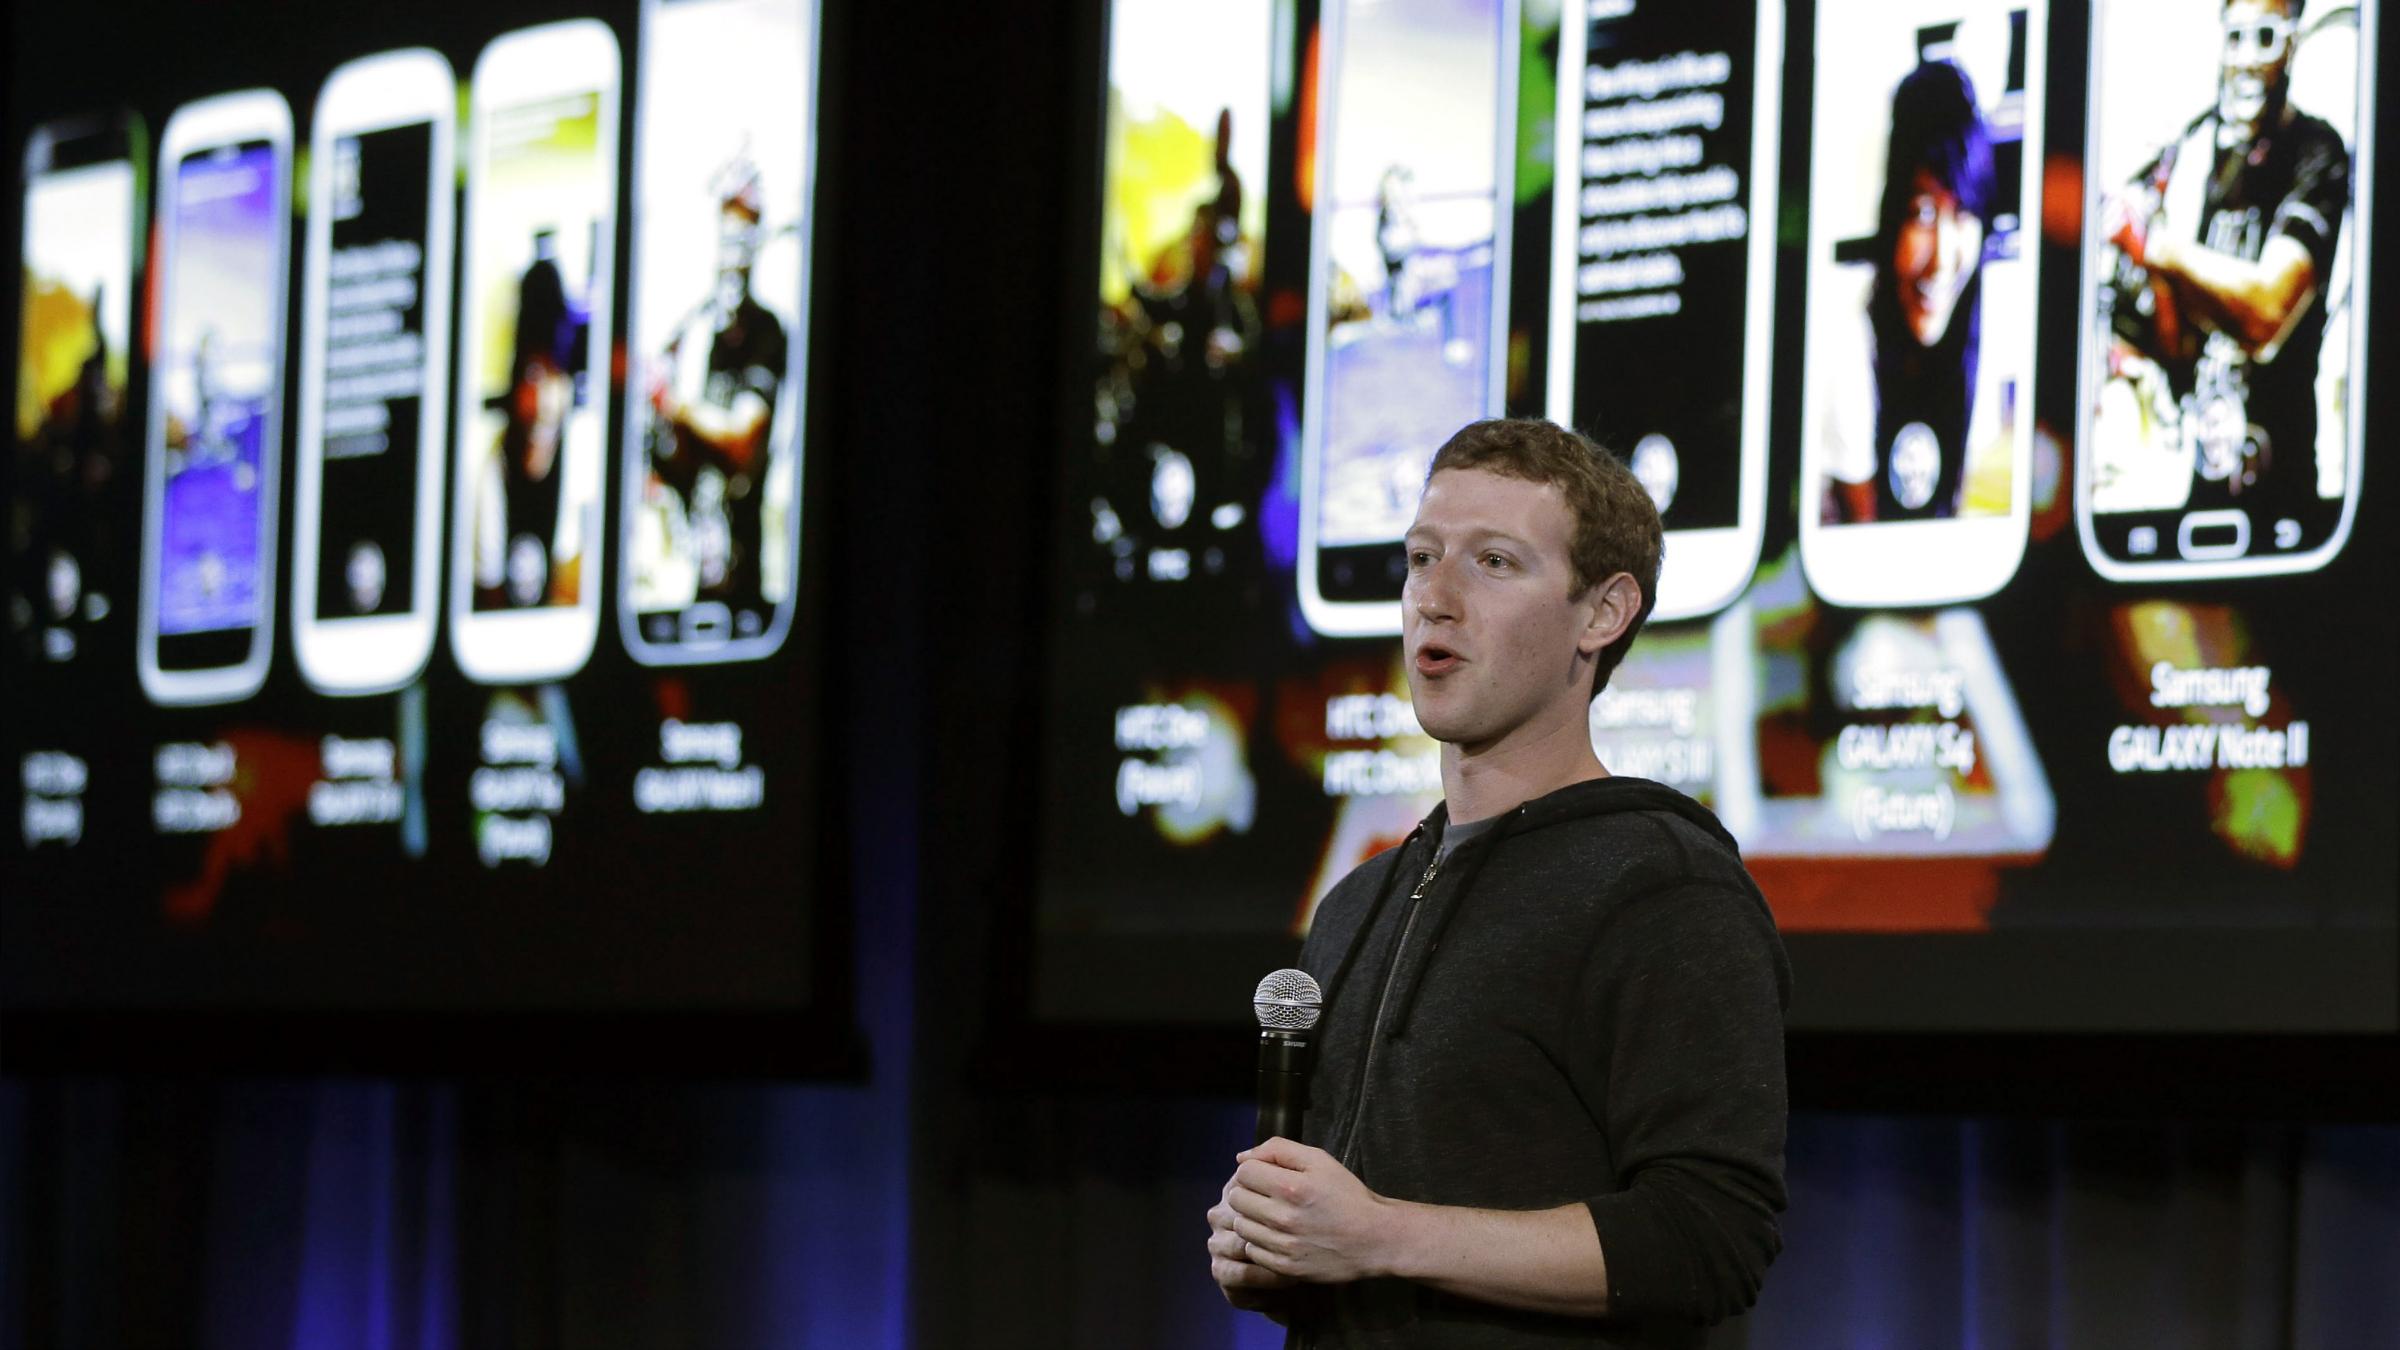 Facebook CEO Mark Zuckerberg speaks at the company's headquarters in Menlo Park, Calif.